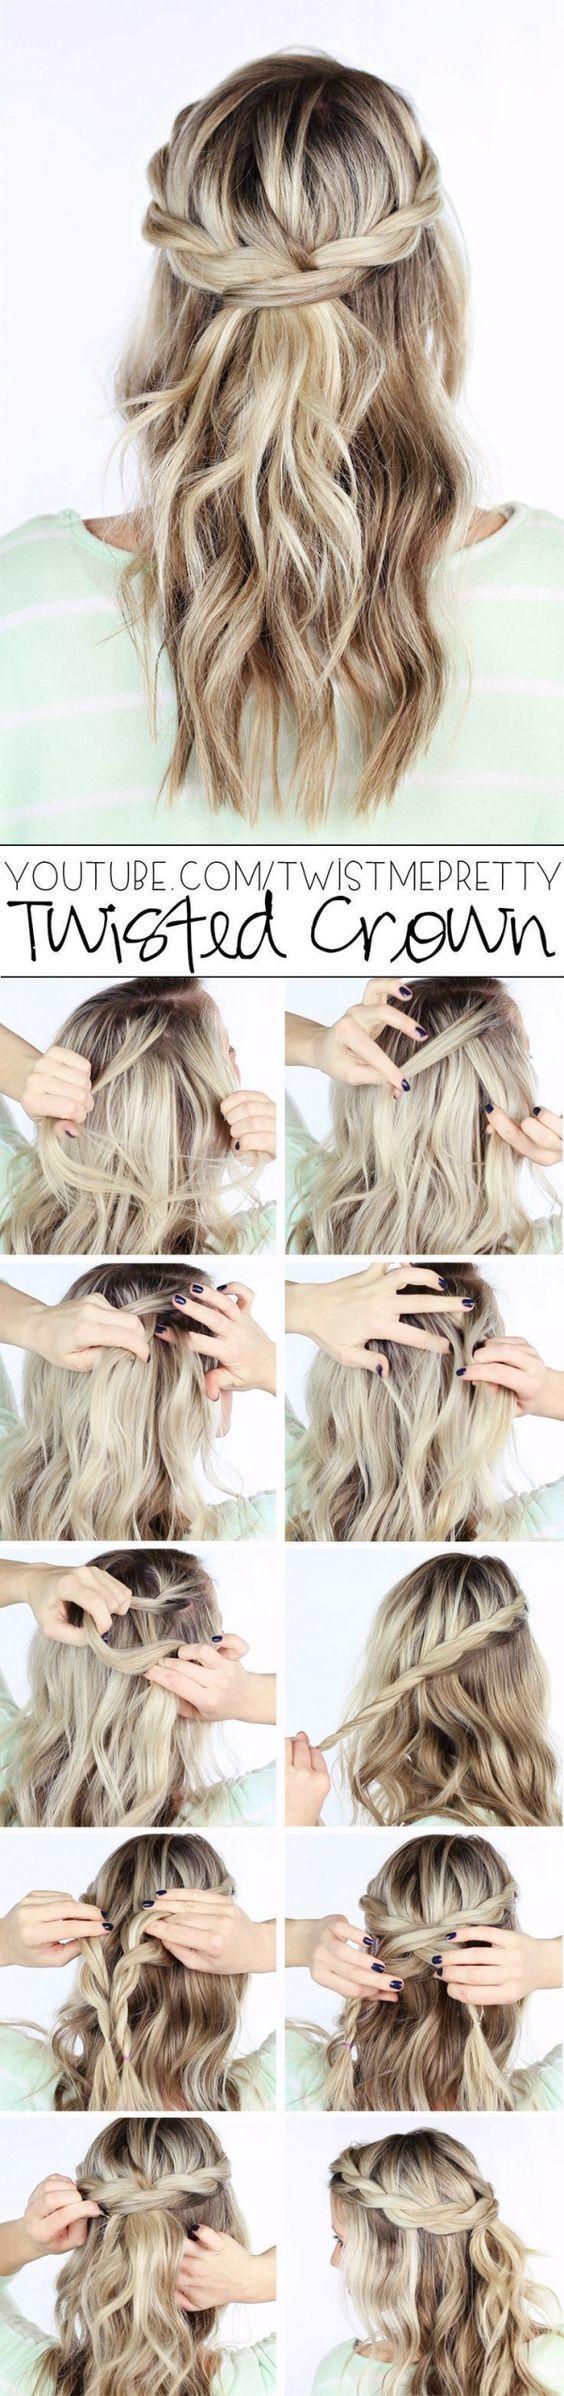 Fabulous Half Up Half Down Hairstyles: #beautyhairstyles